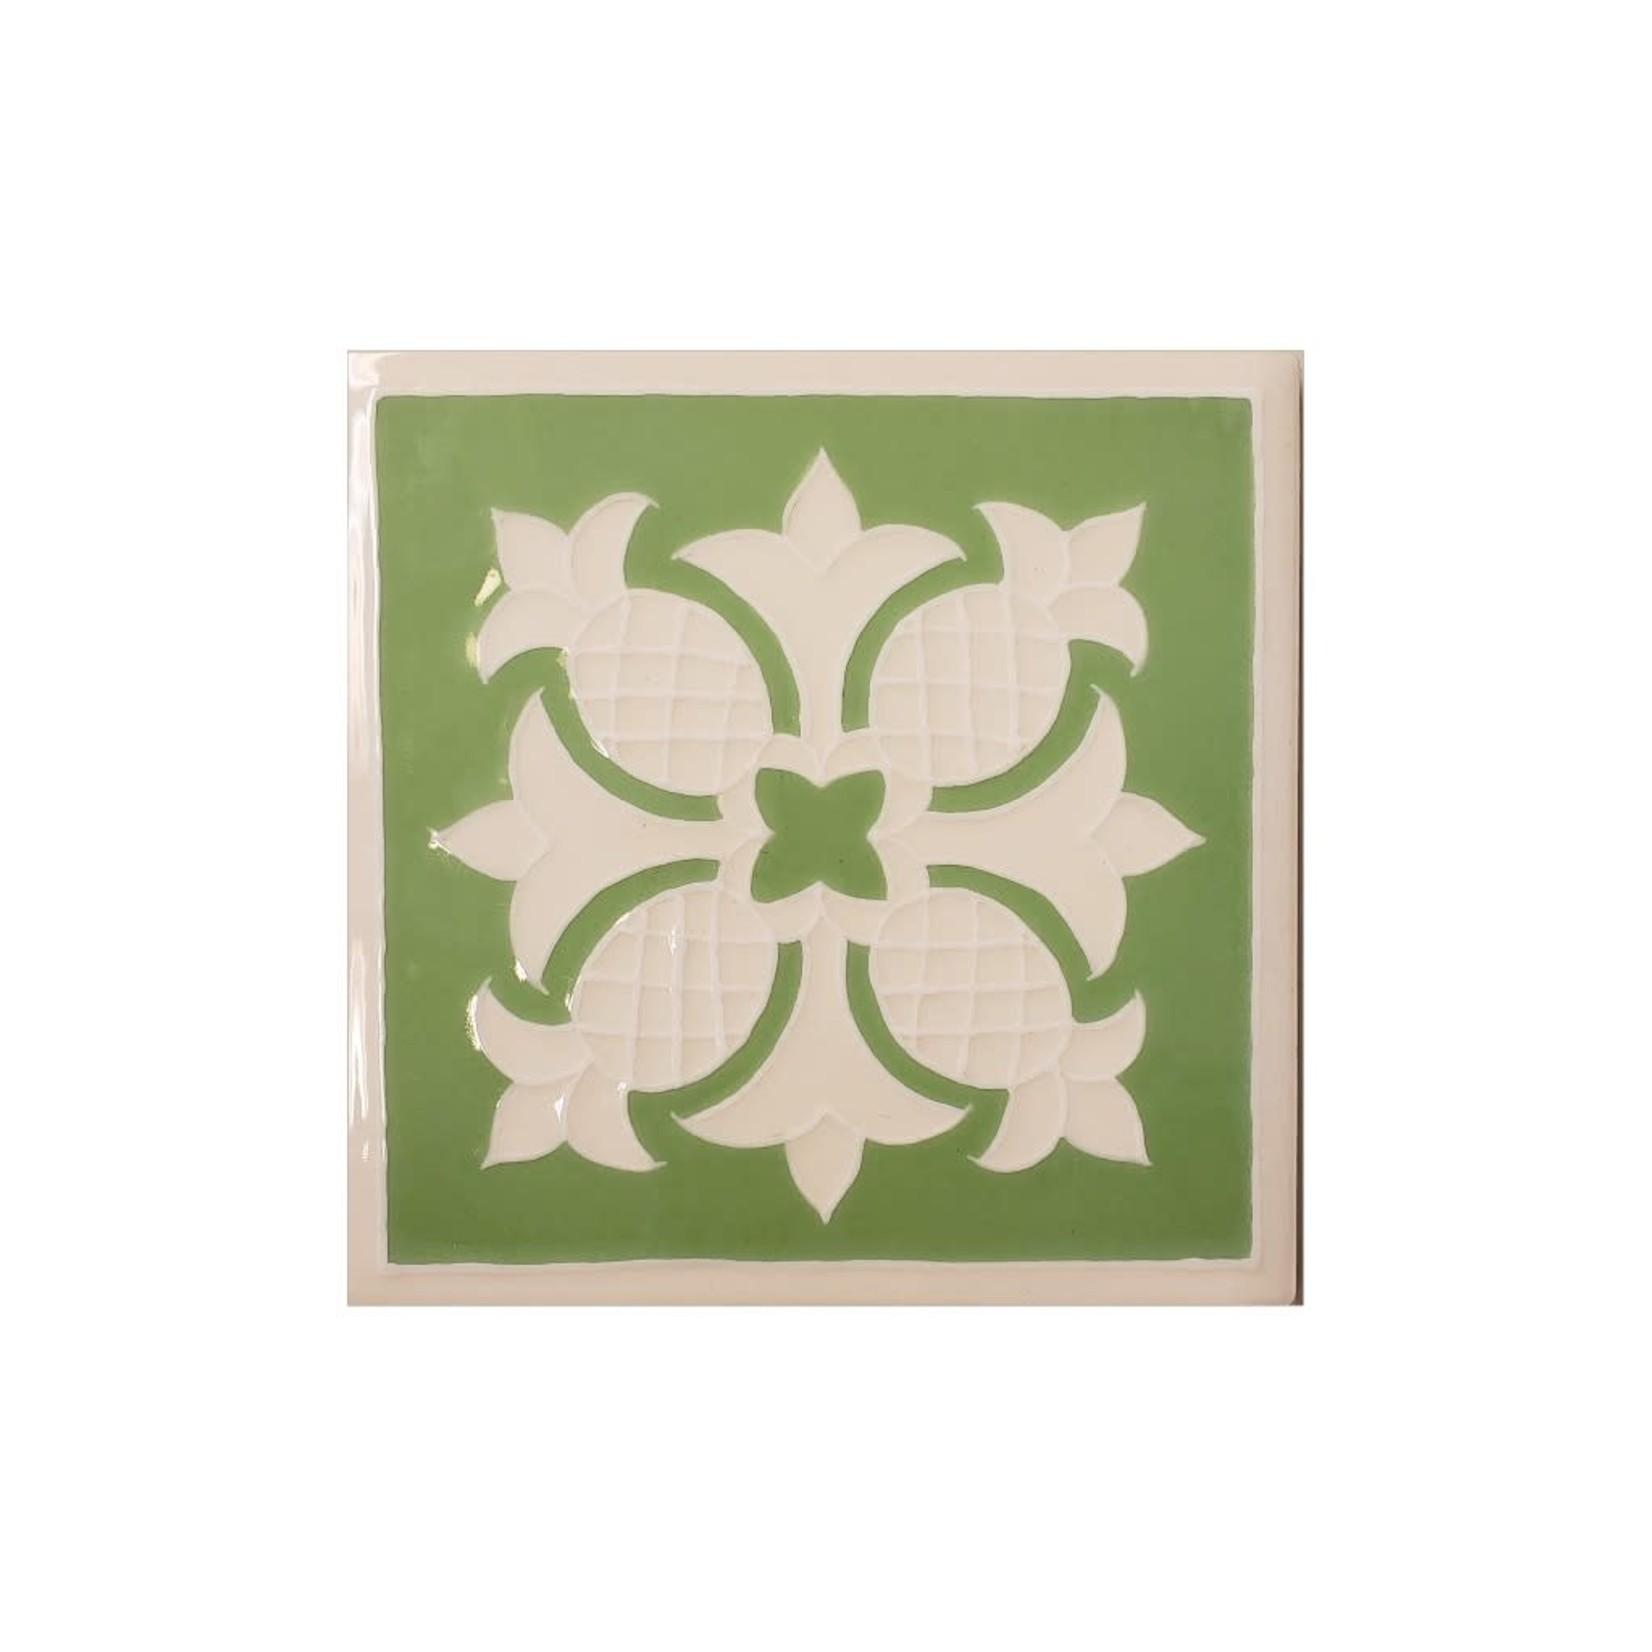 Banana Patch Studio Quilt Tile